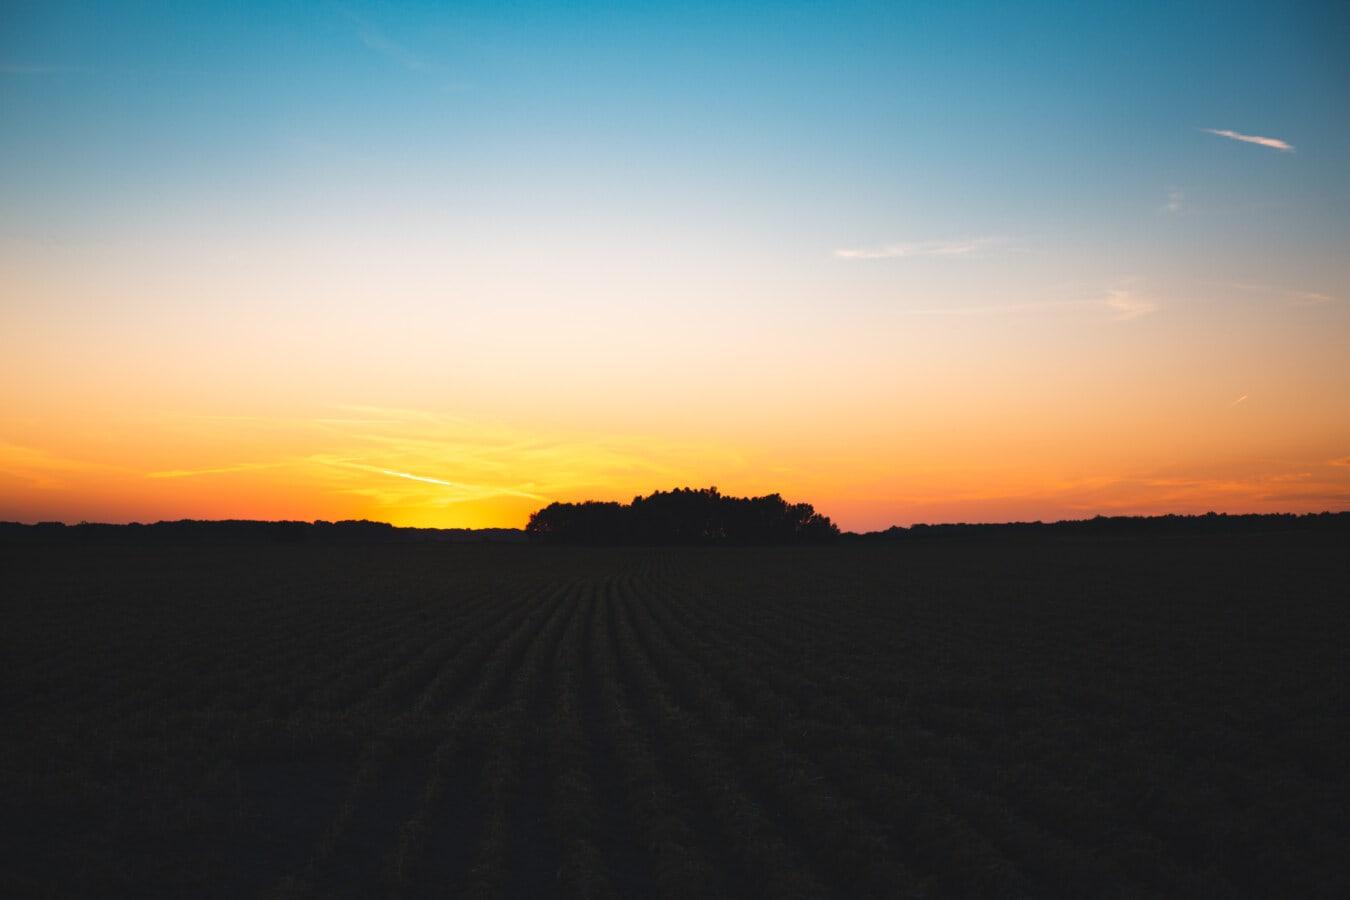 night, twilight, field, agriculture, sunset, farmland, clouds, dawn, landscape, star